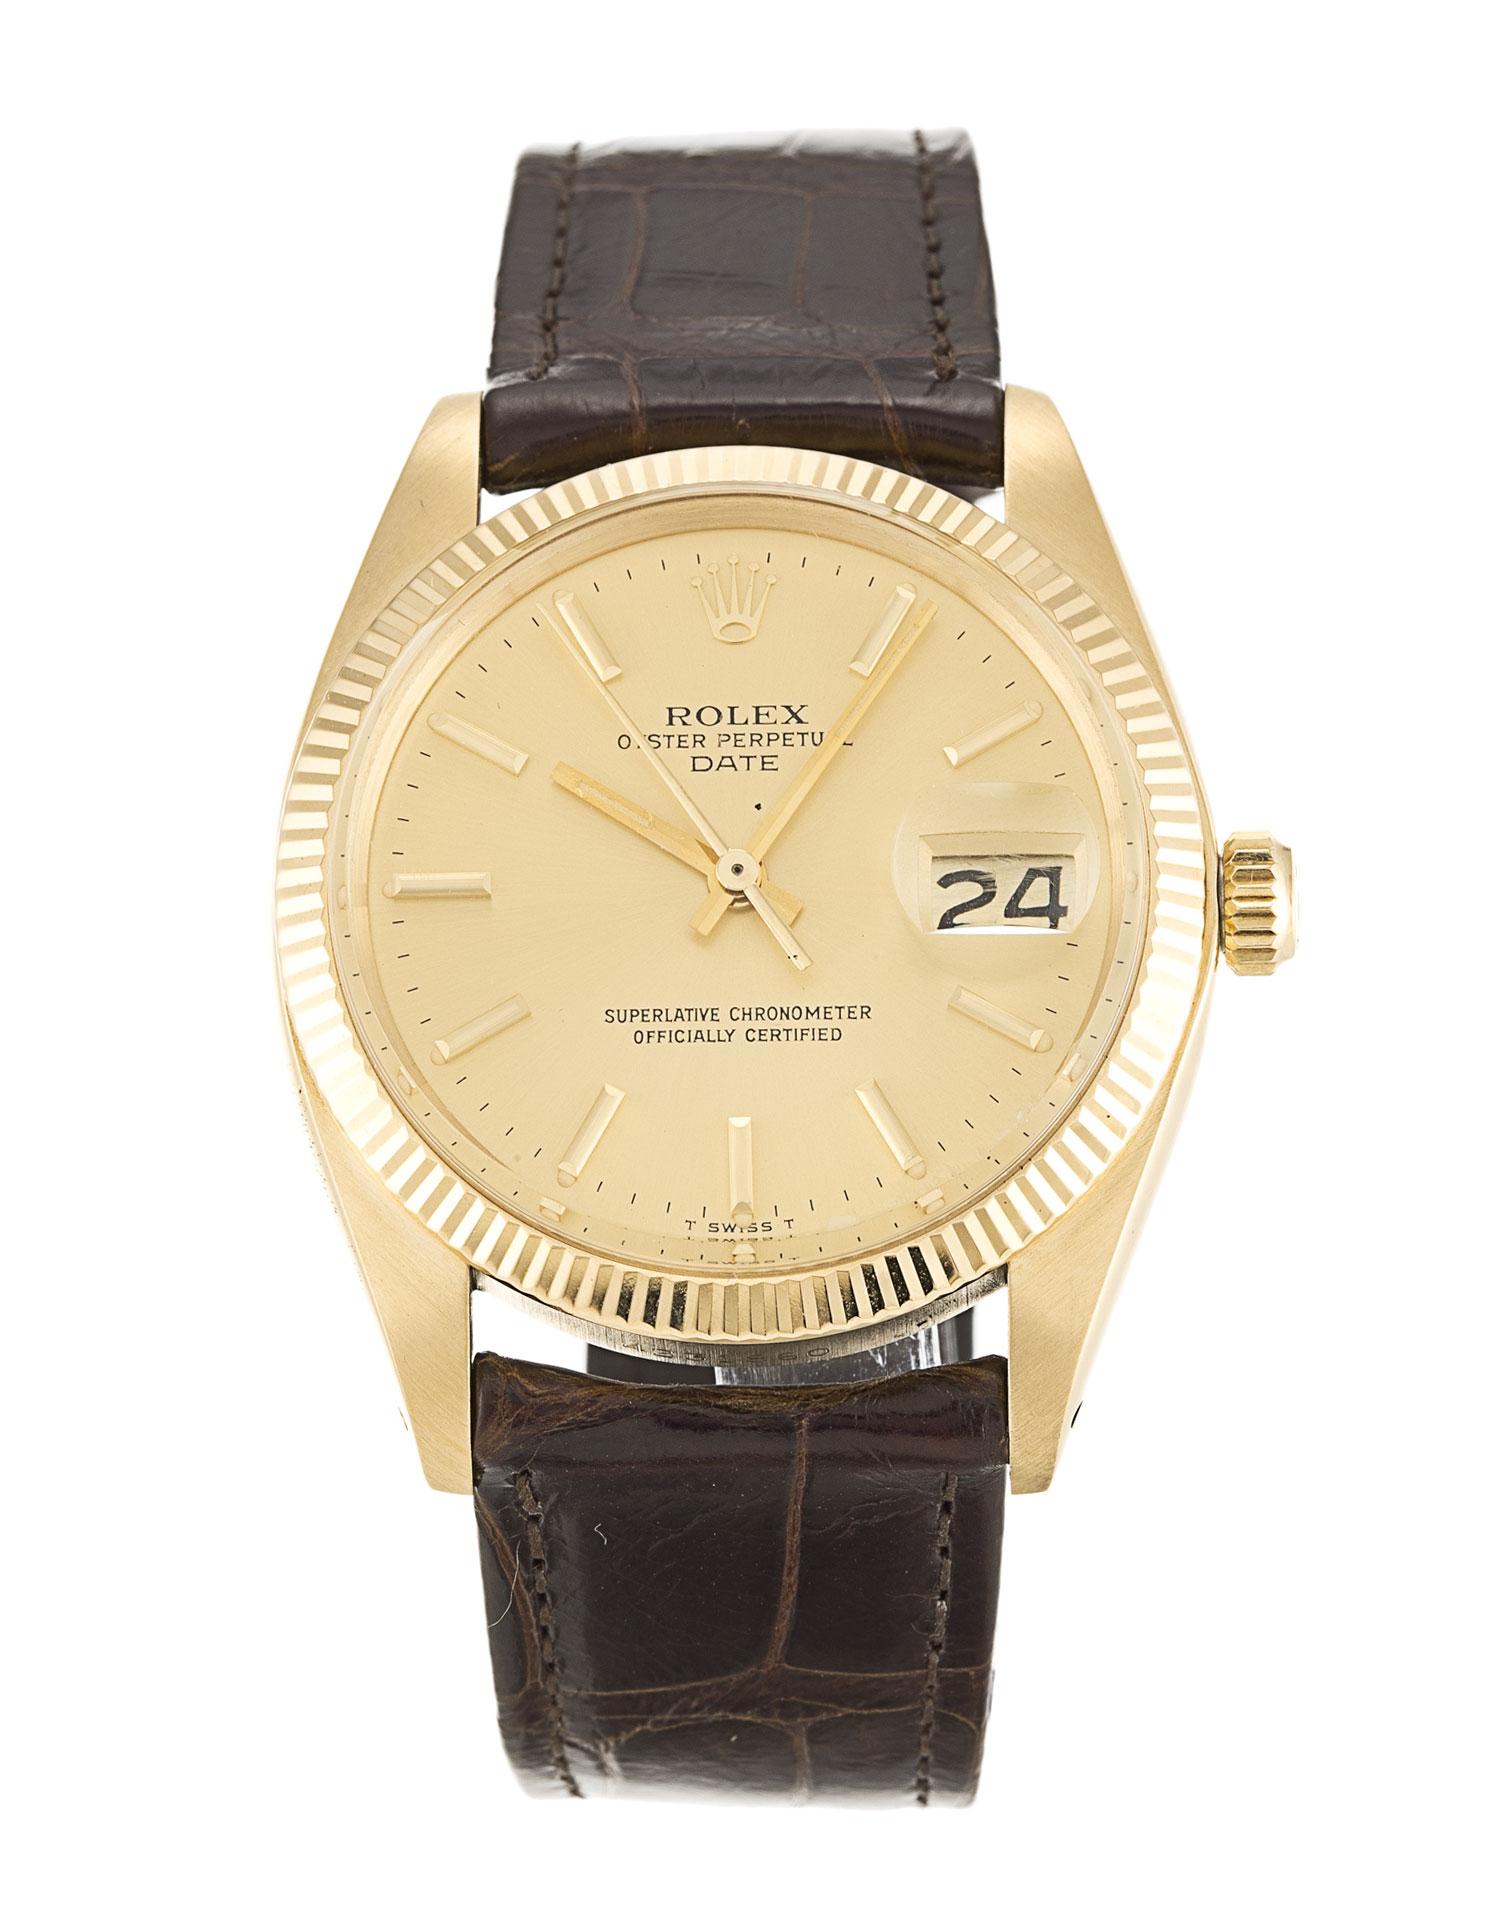 replica Rolex Oyster Perpetual Date 1503 33MM Champagne Dial